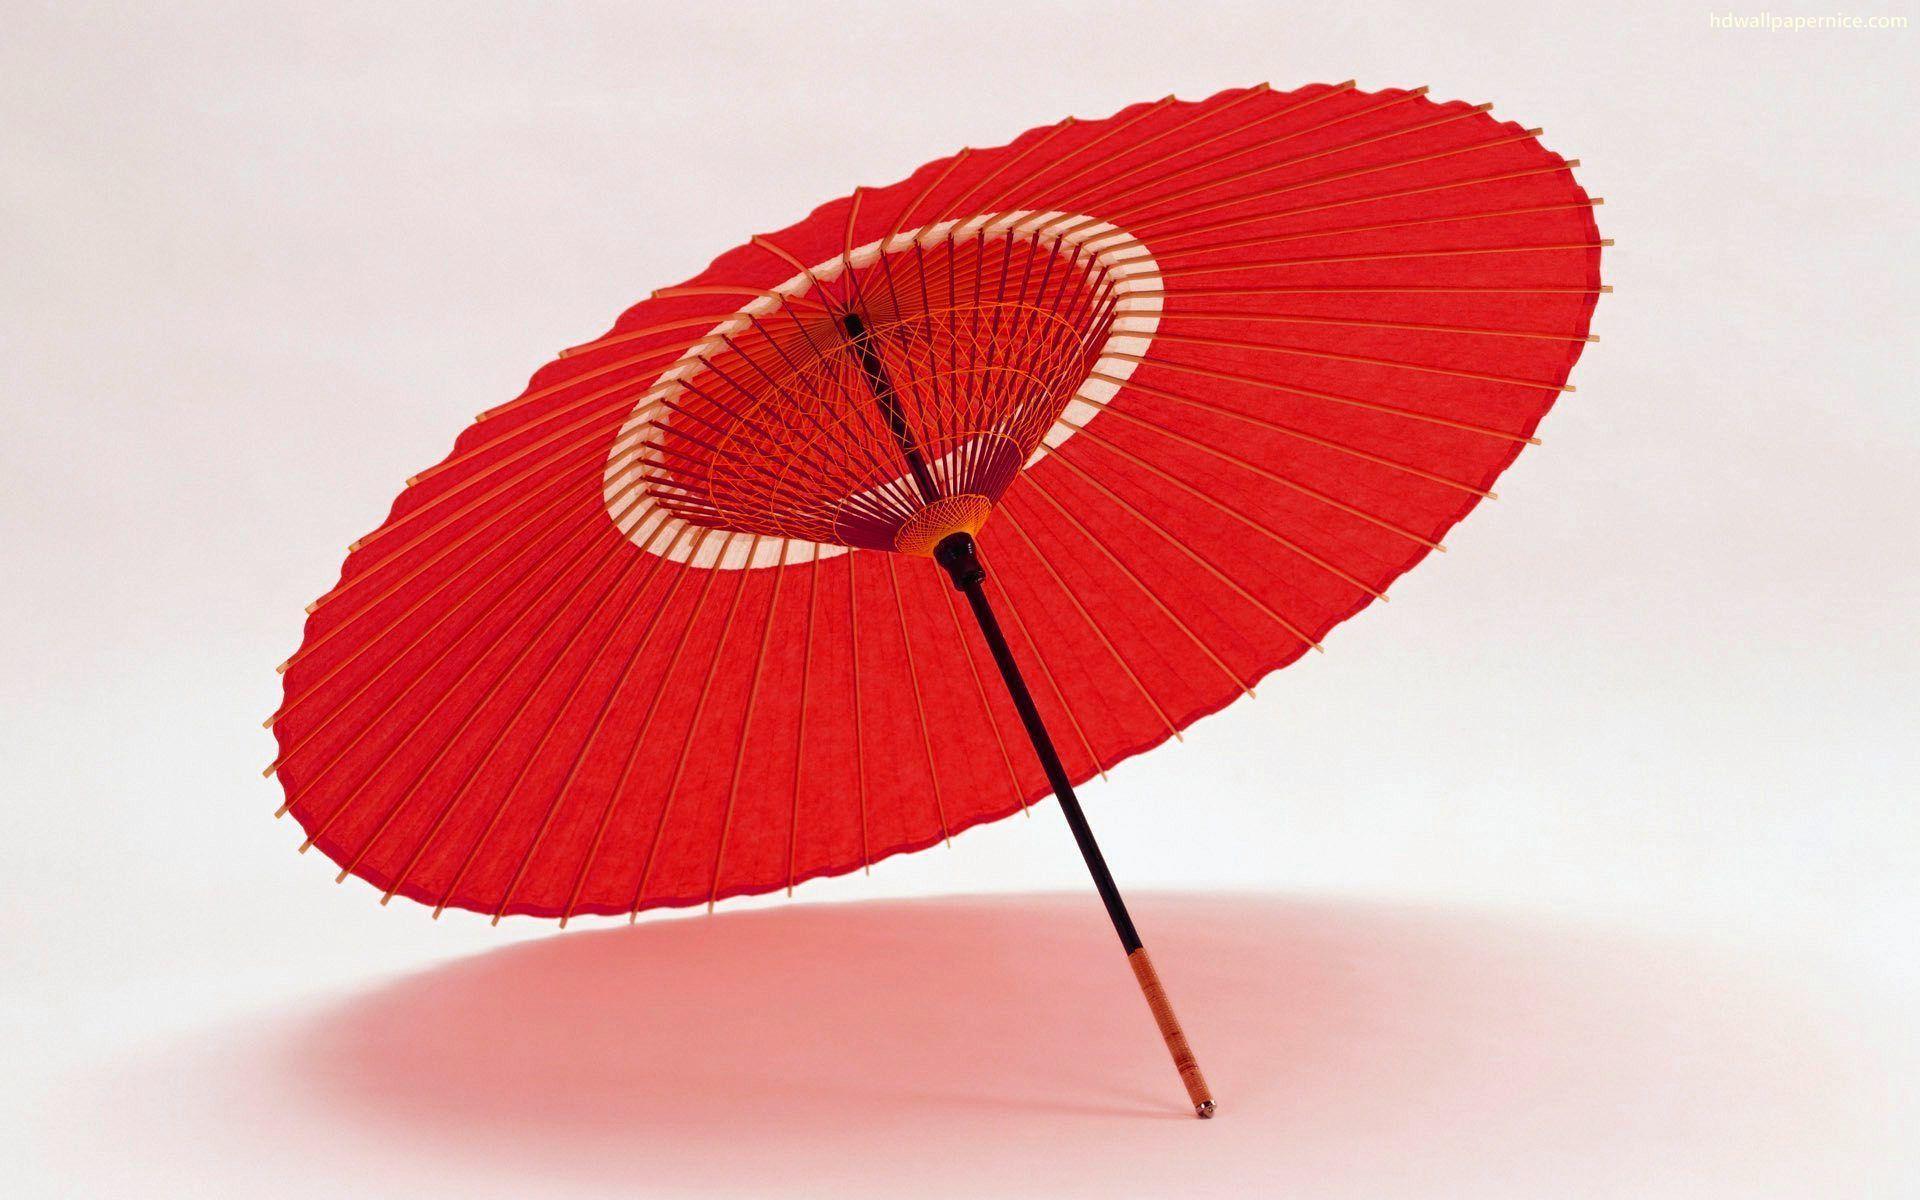 Tokyo Geisha Girl Wallpaper 1920x1080 Japanese Umbrella Wallpapers Top Free Japanese Umbrella